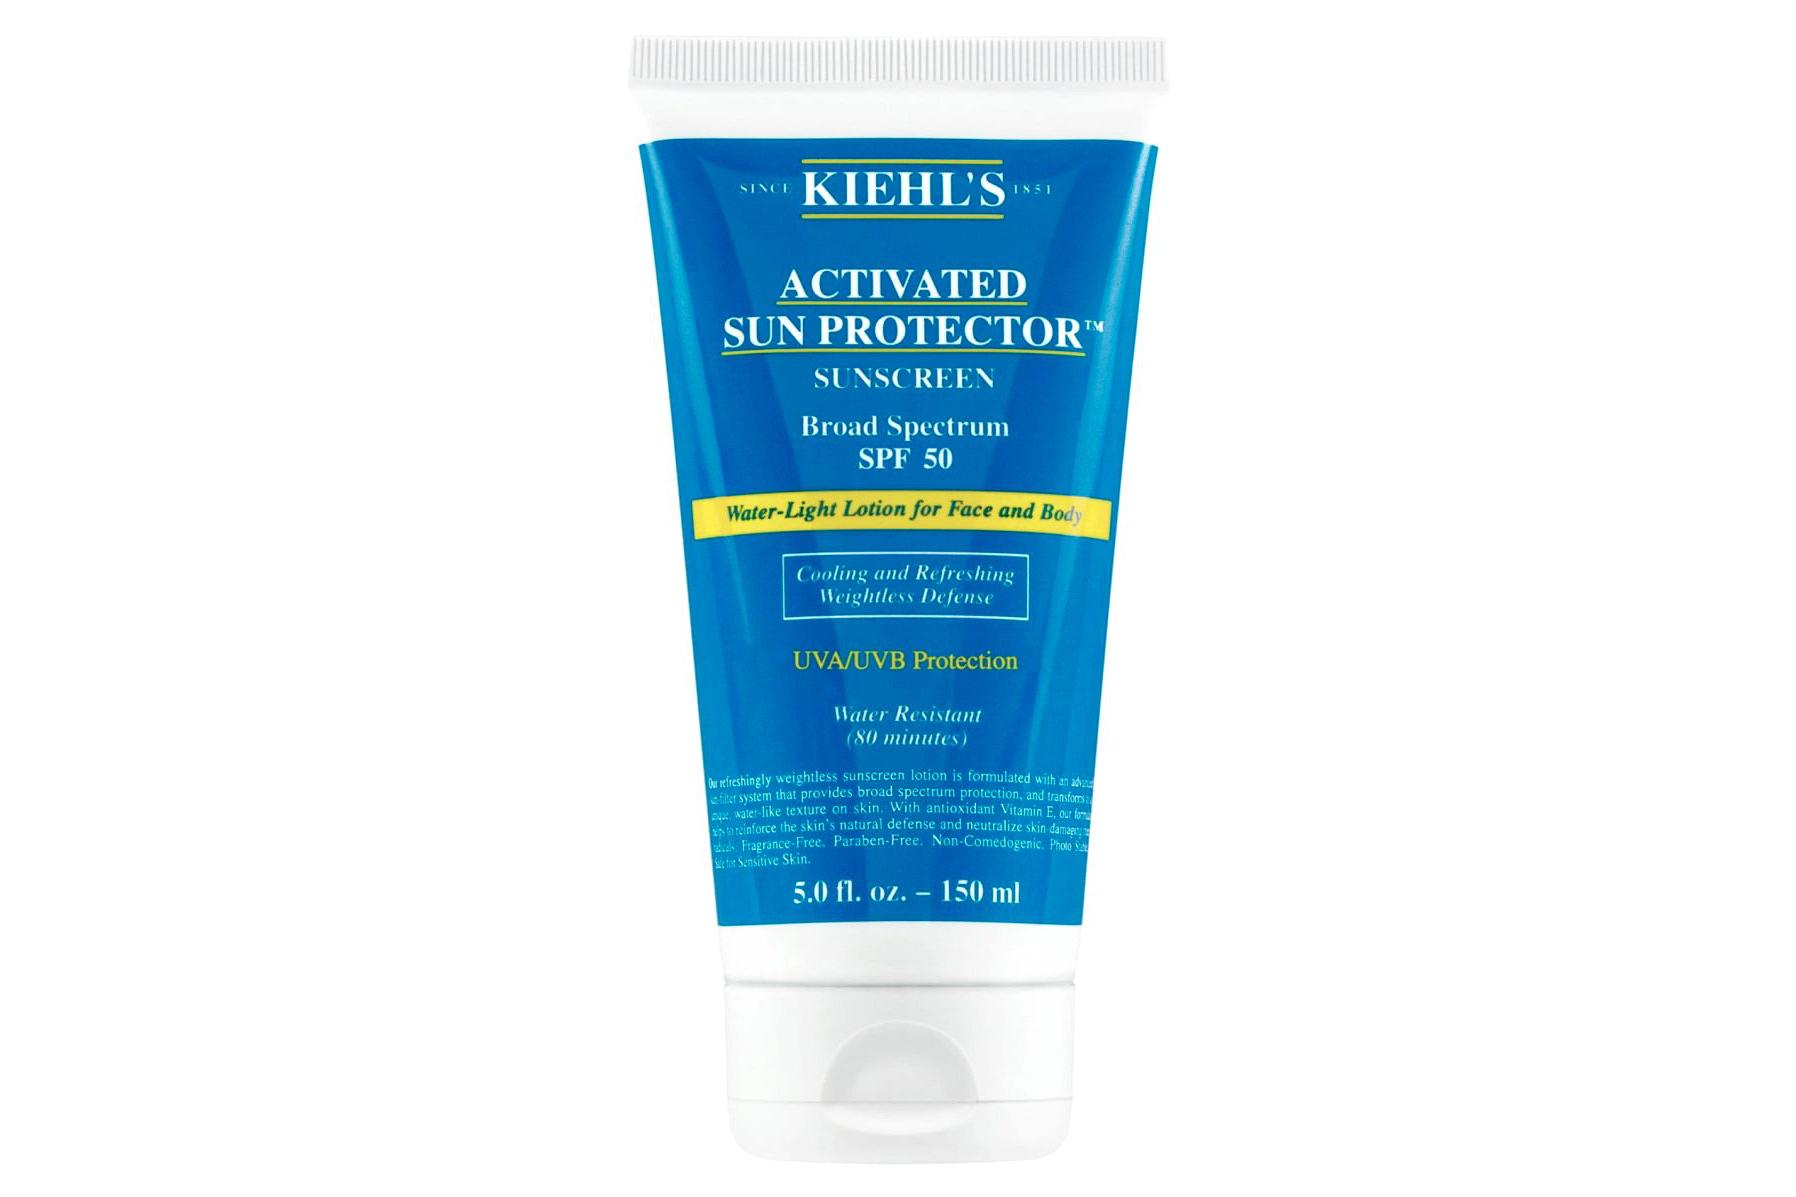 kiehls sunscreen